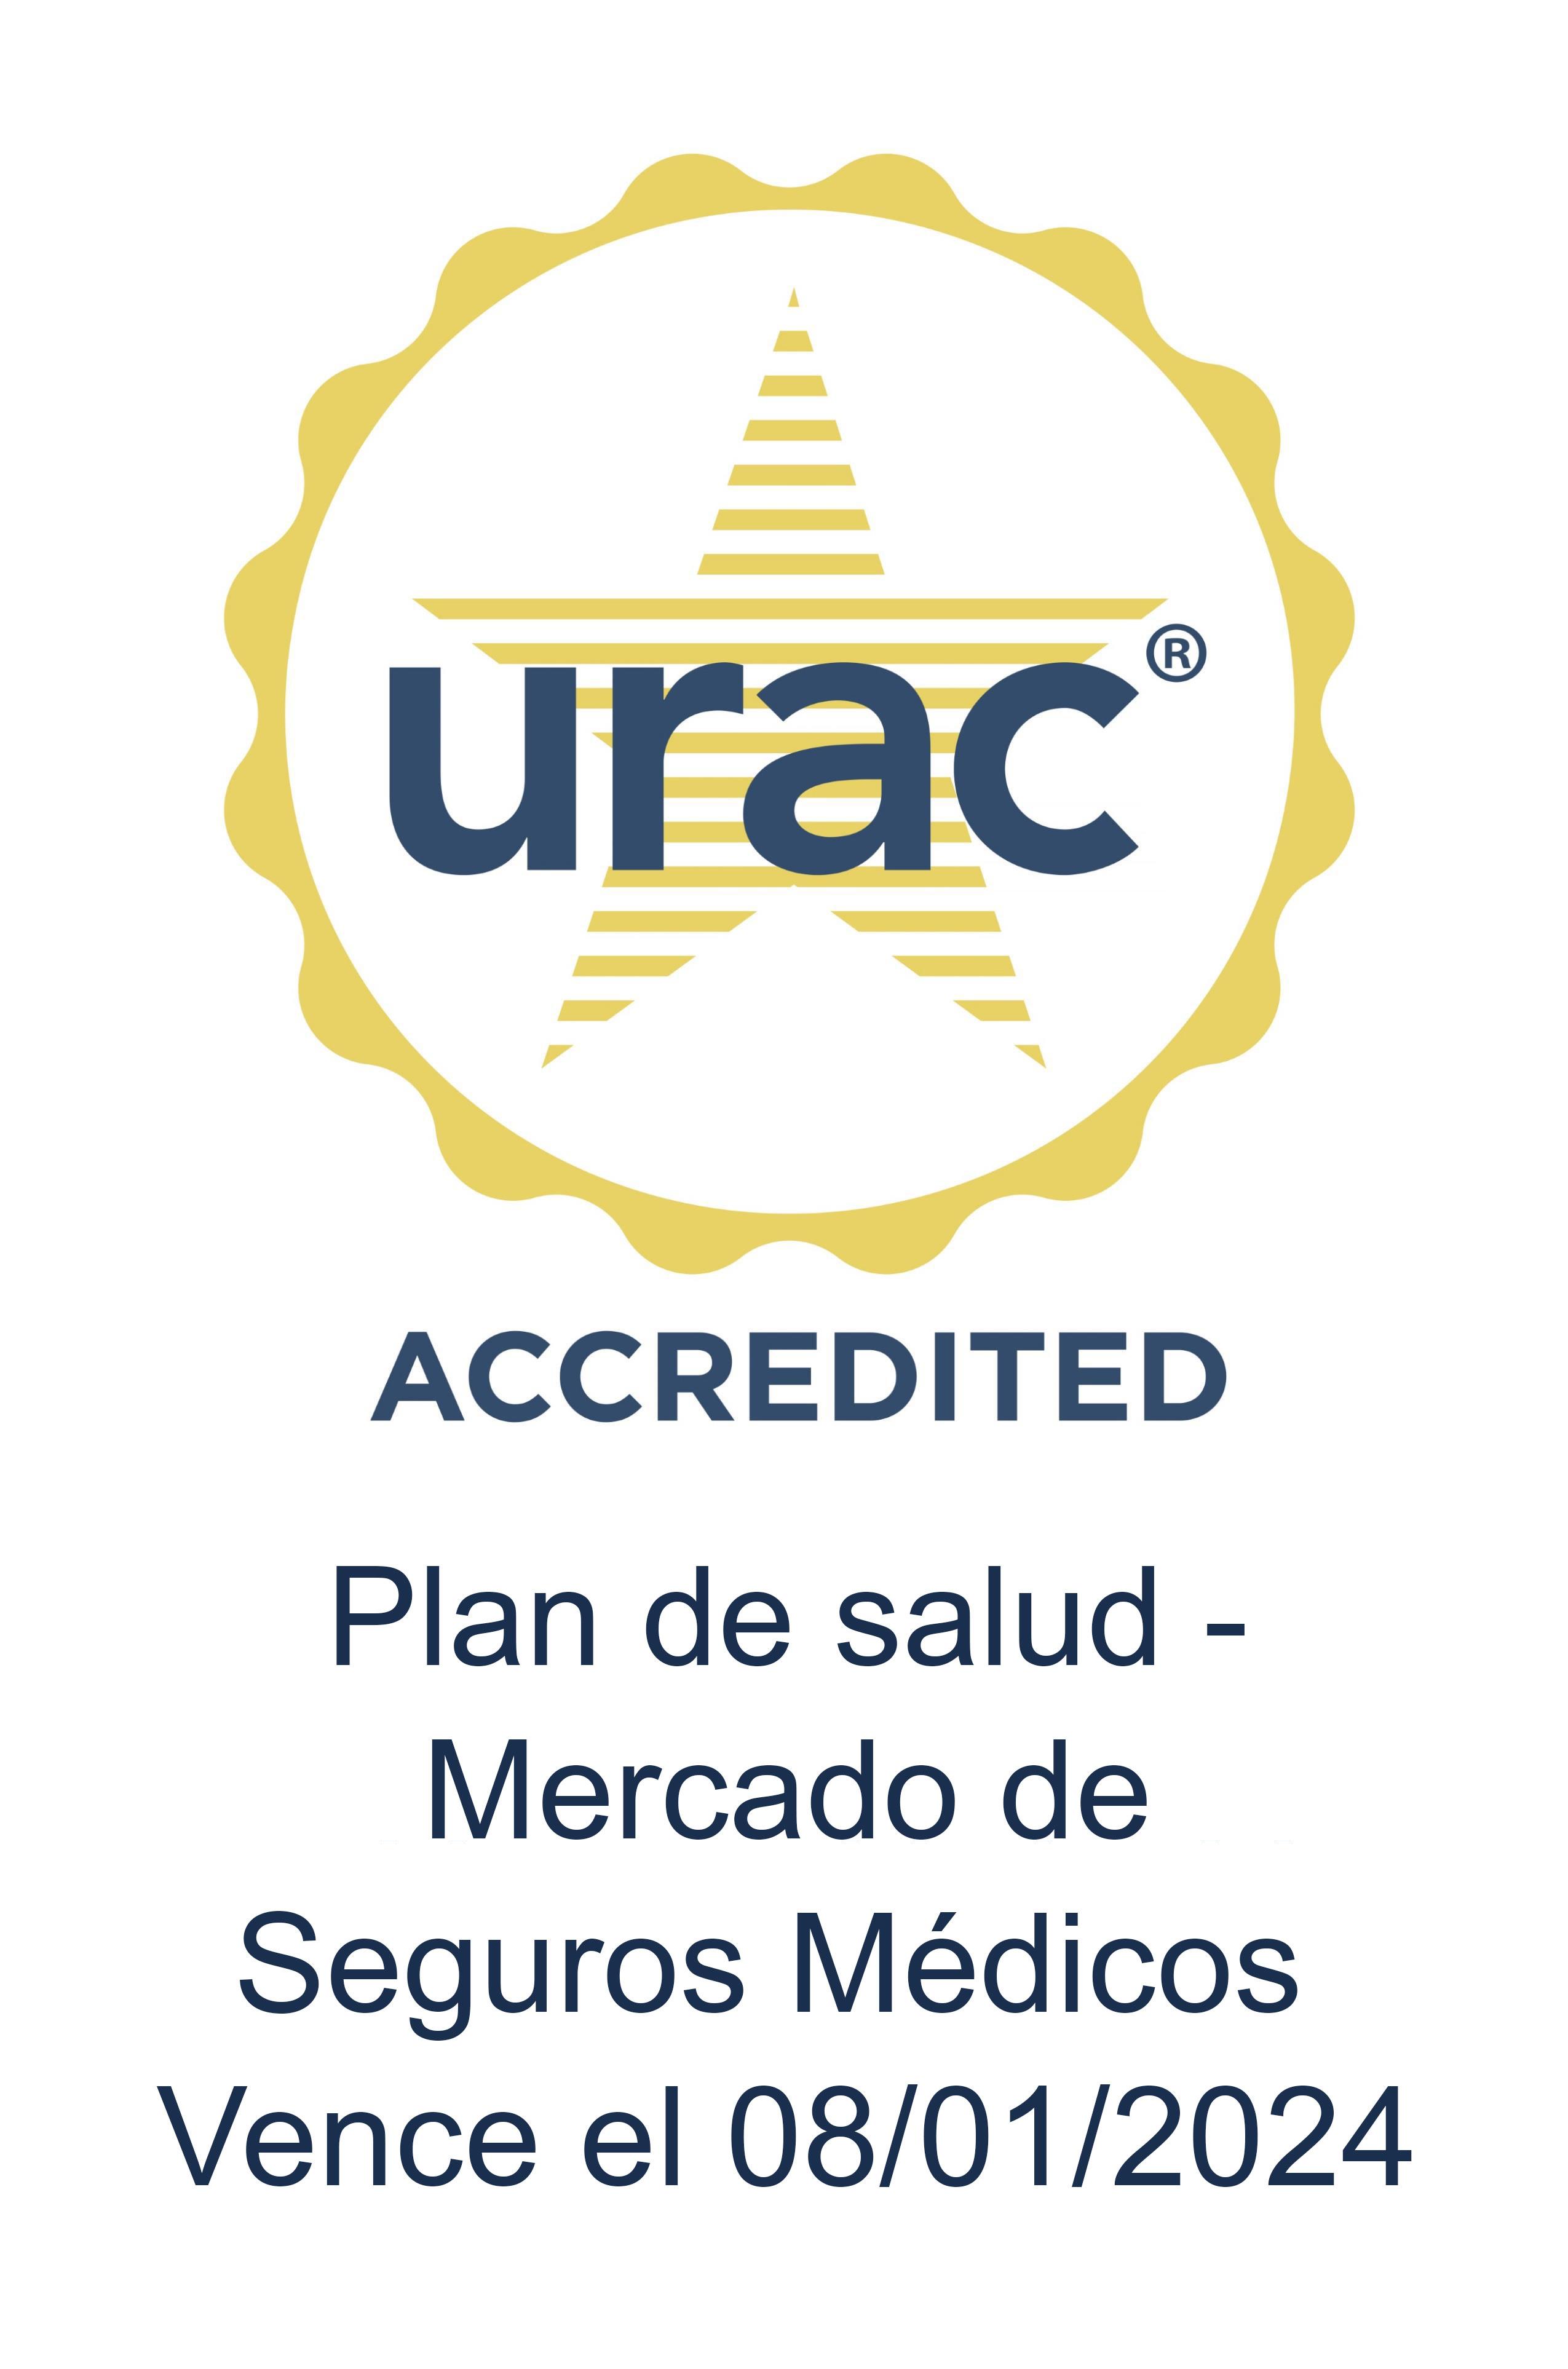 logotipo de urac accredited